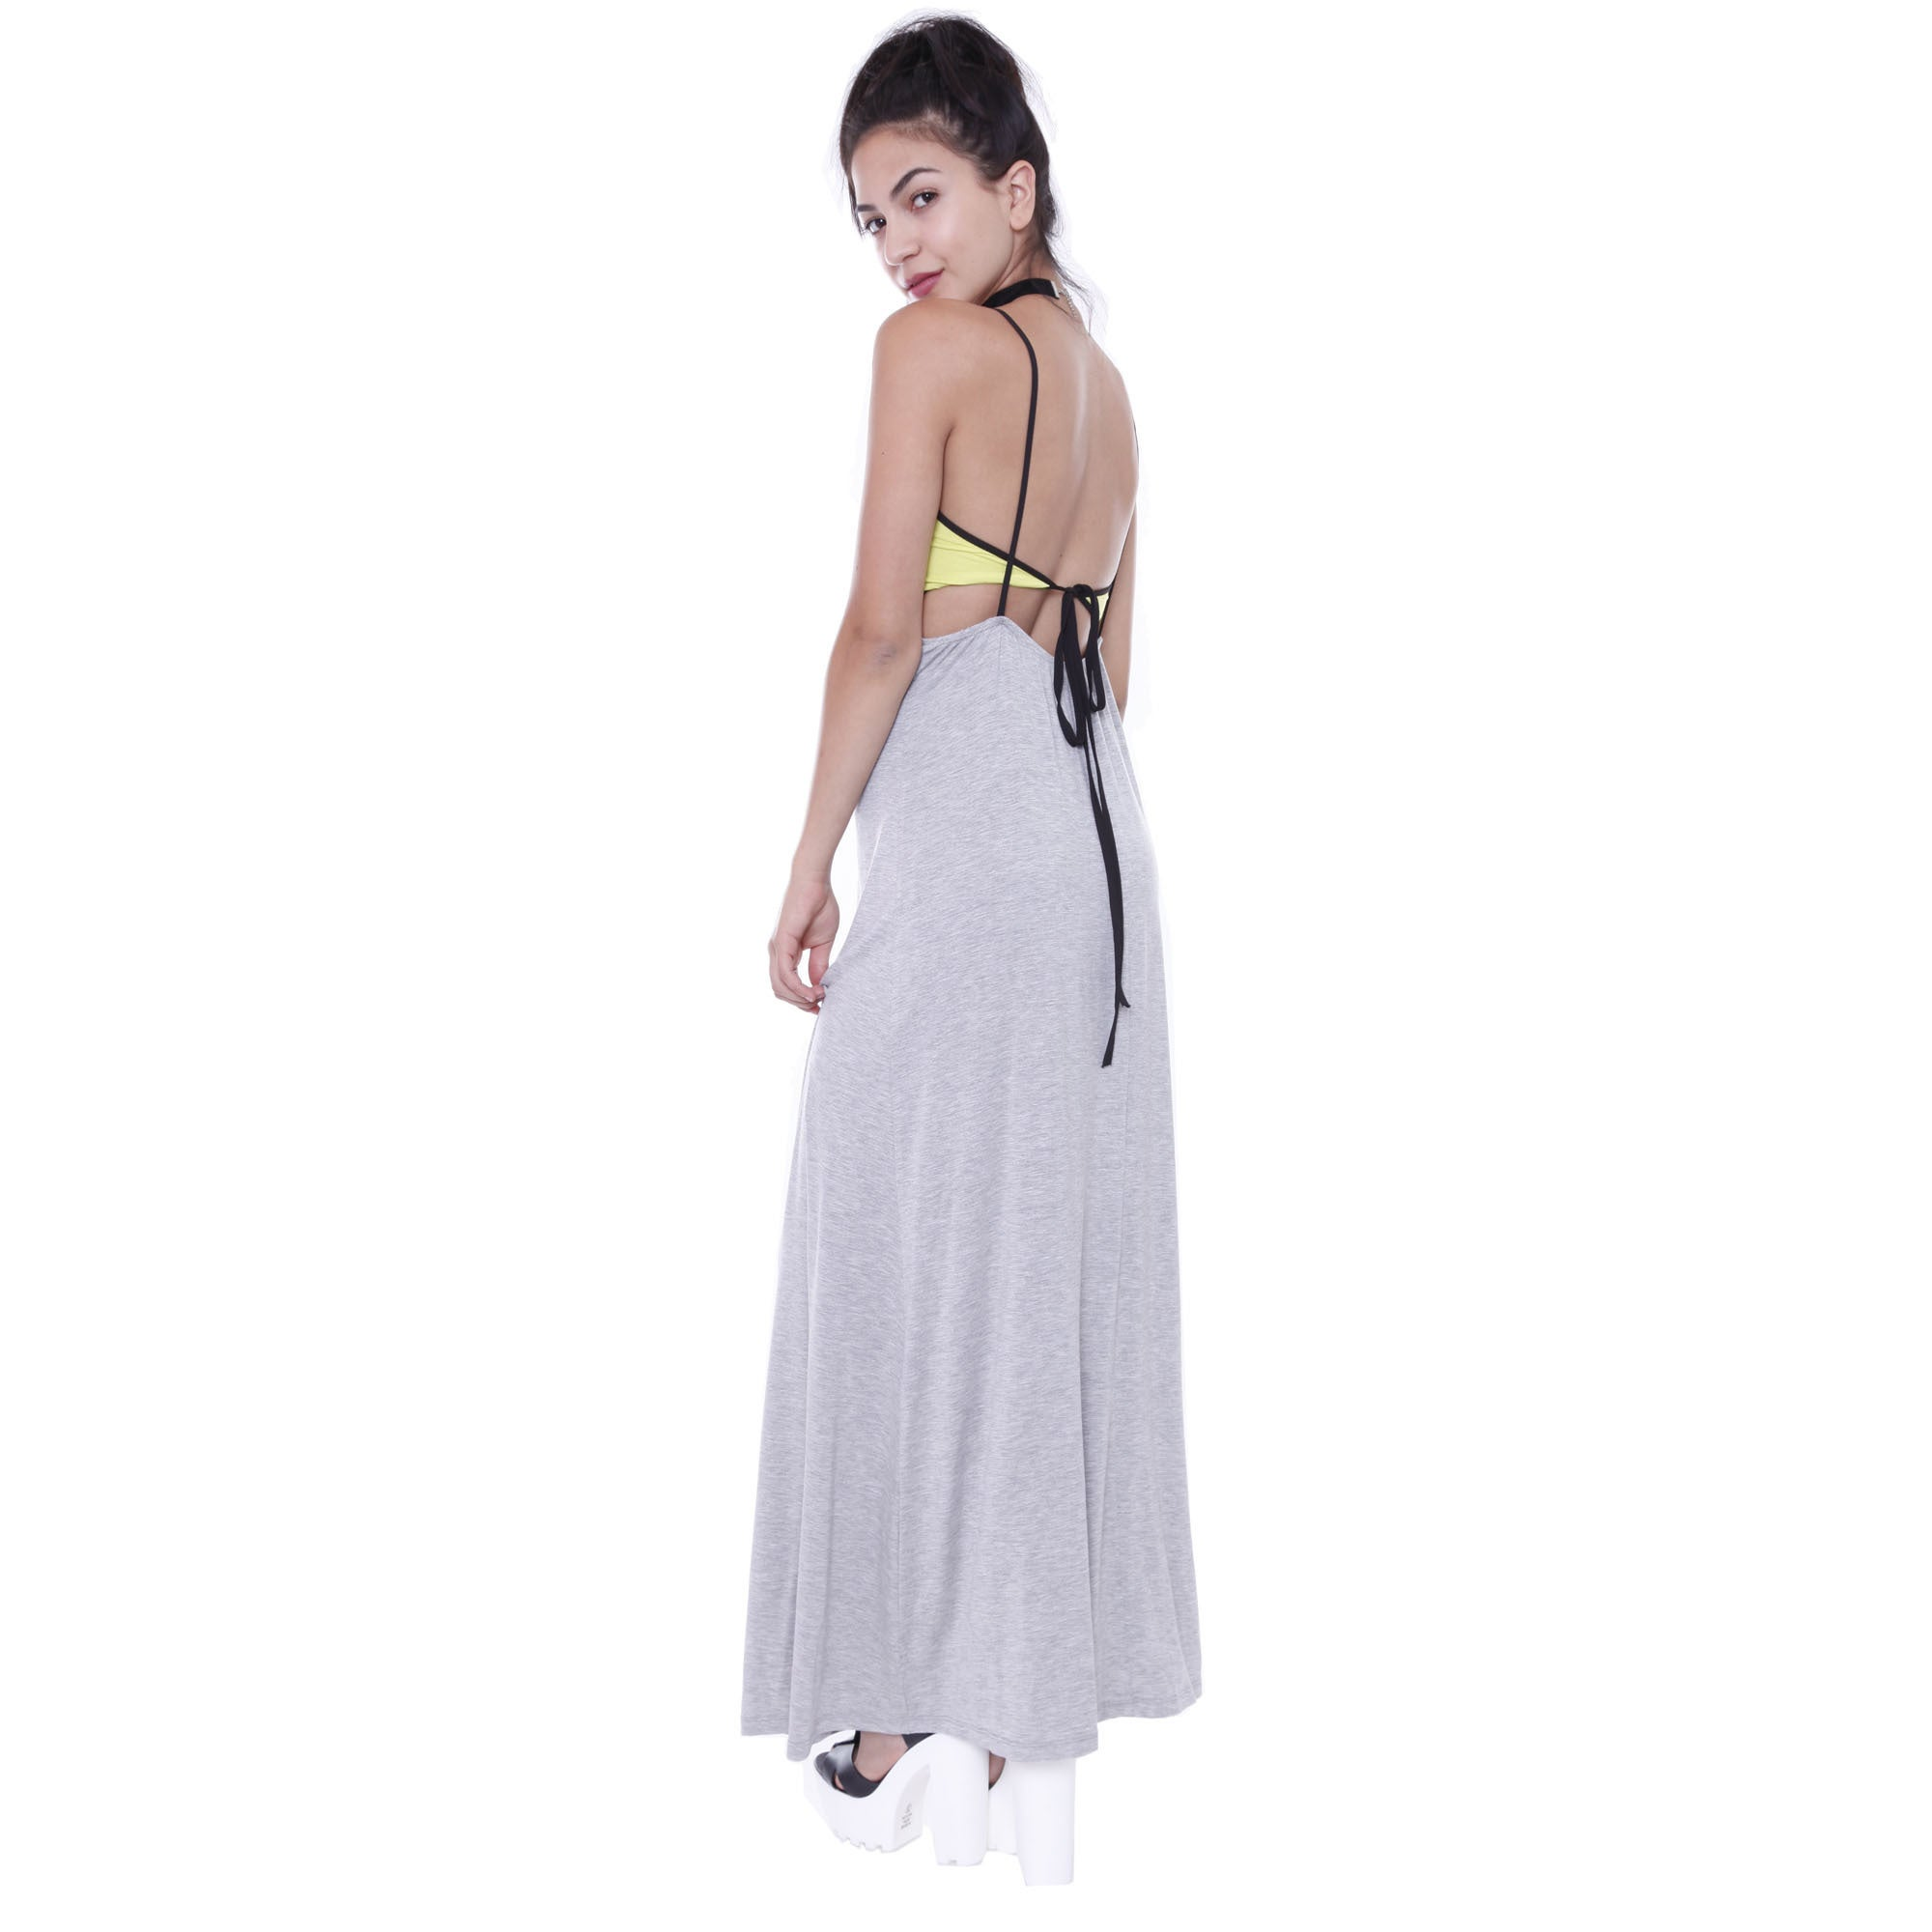 8cee0cf39 Juniors Maxi Dresses Target